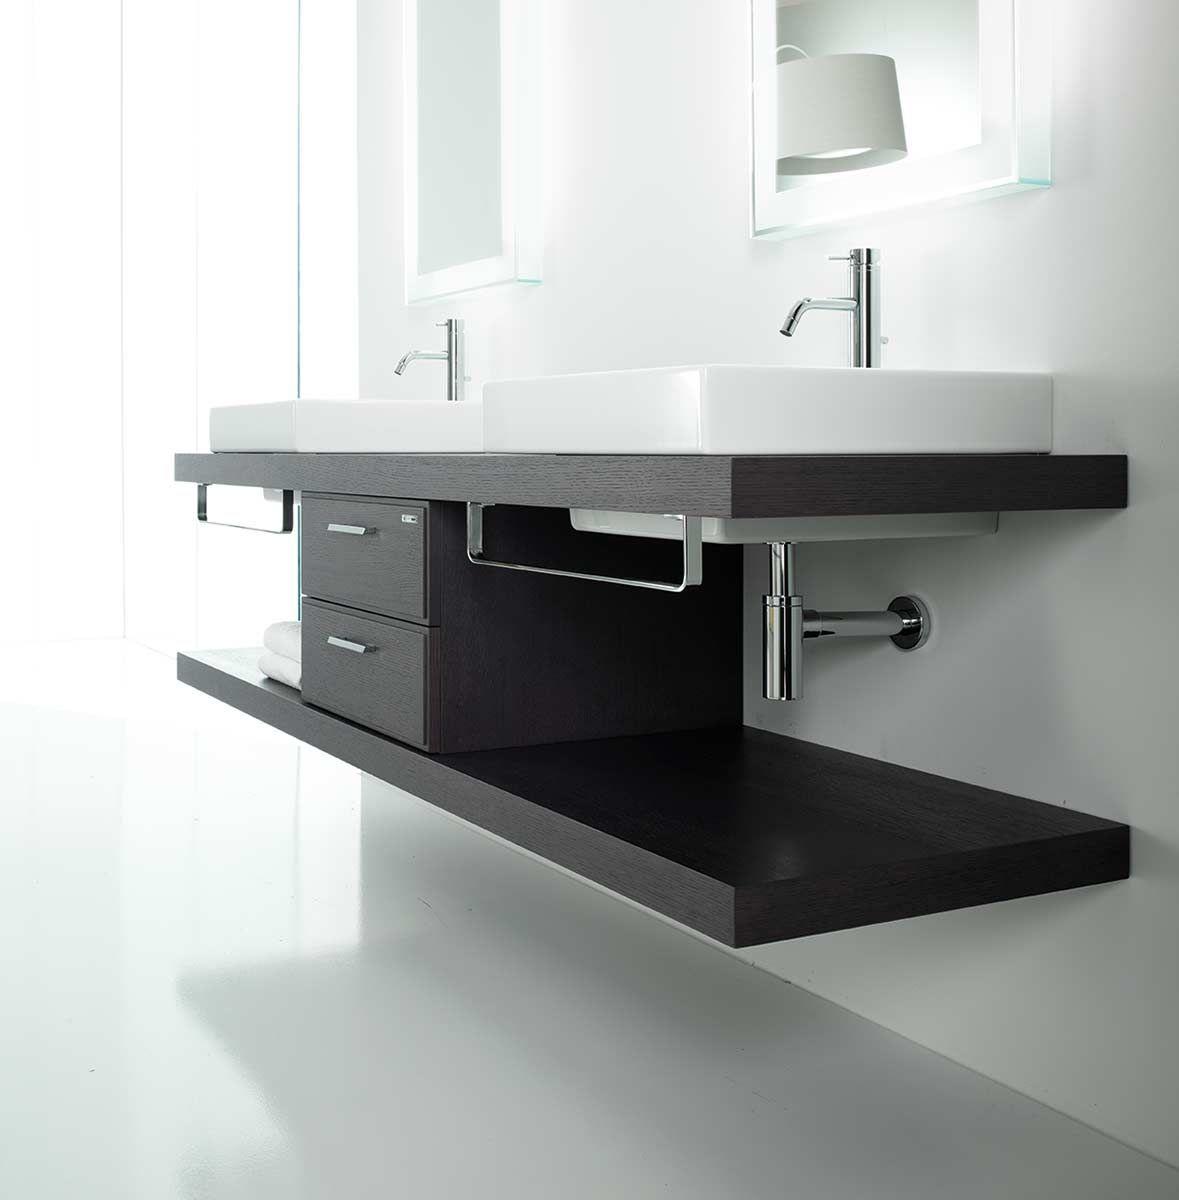 Berloni Bagno | Berloni Bath Cabinetry | Pinterest | Bath